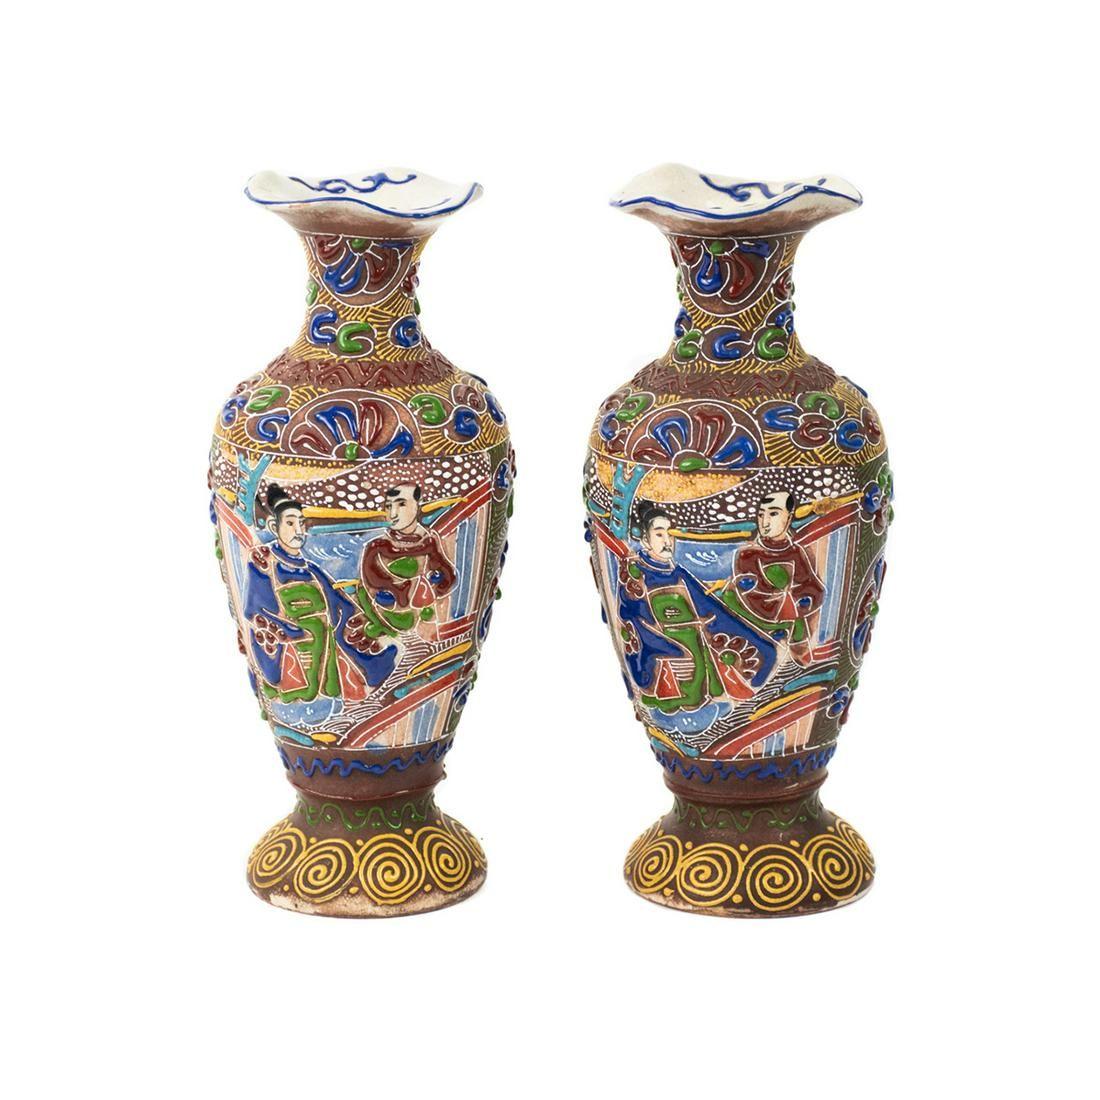 Pair of Japanese Satsuma Porcelain Moriage Vases